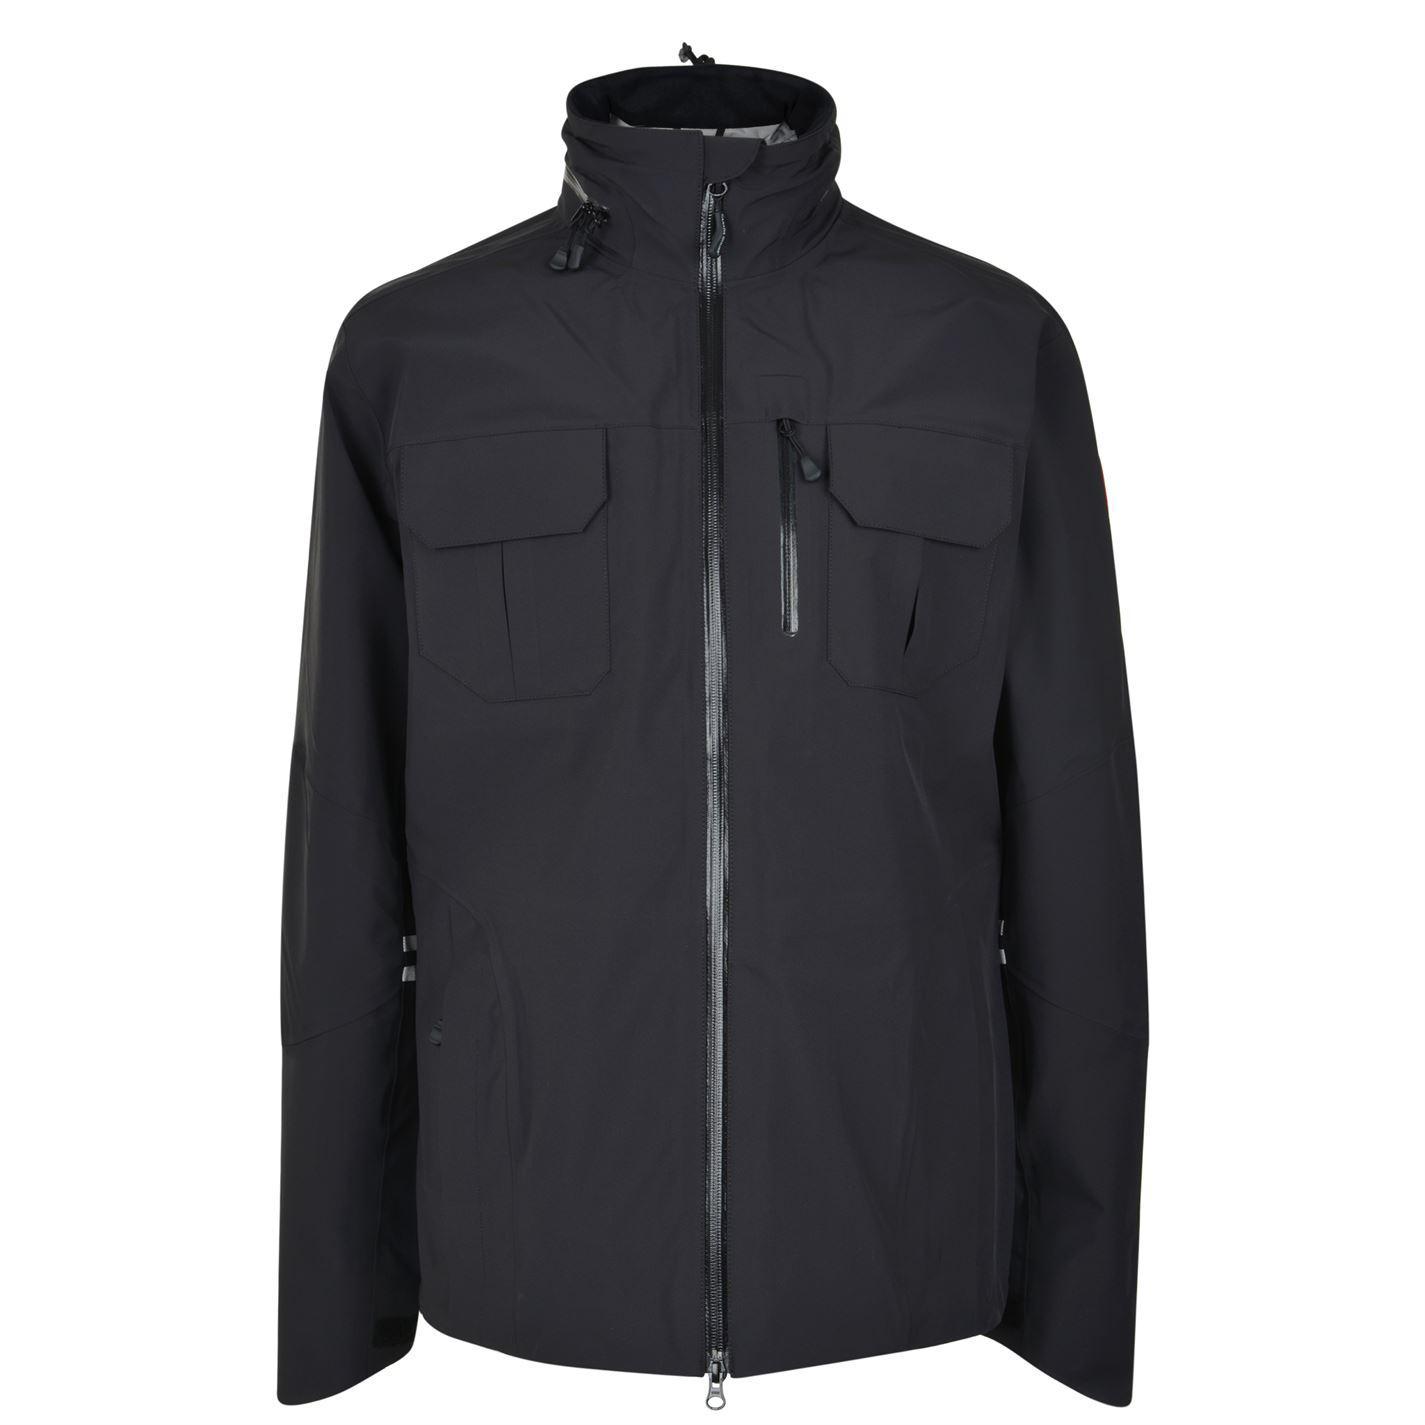 Canada Goose. Men's Black Moraine Jacket